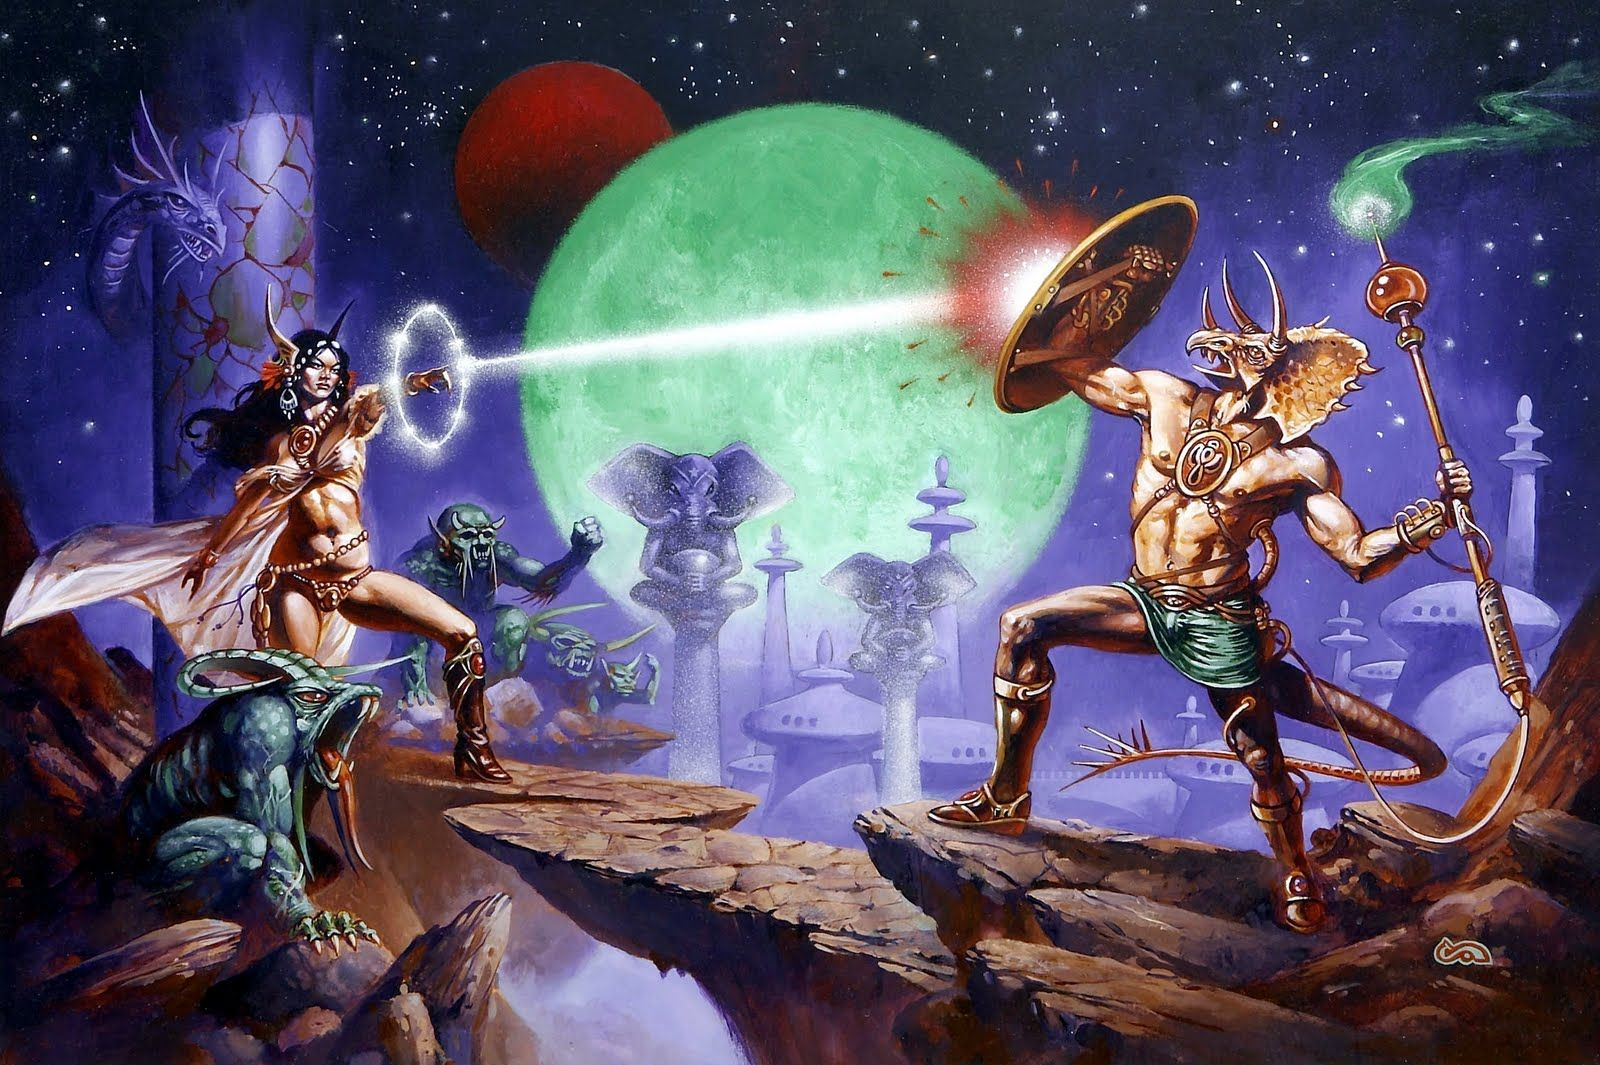 Heavy Metal Sci-Fi Art   Sci-Fi and Fantasy Picture Thread